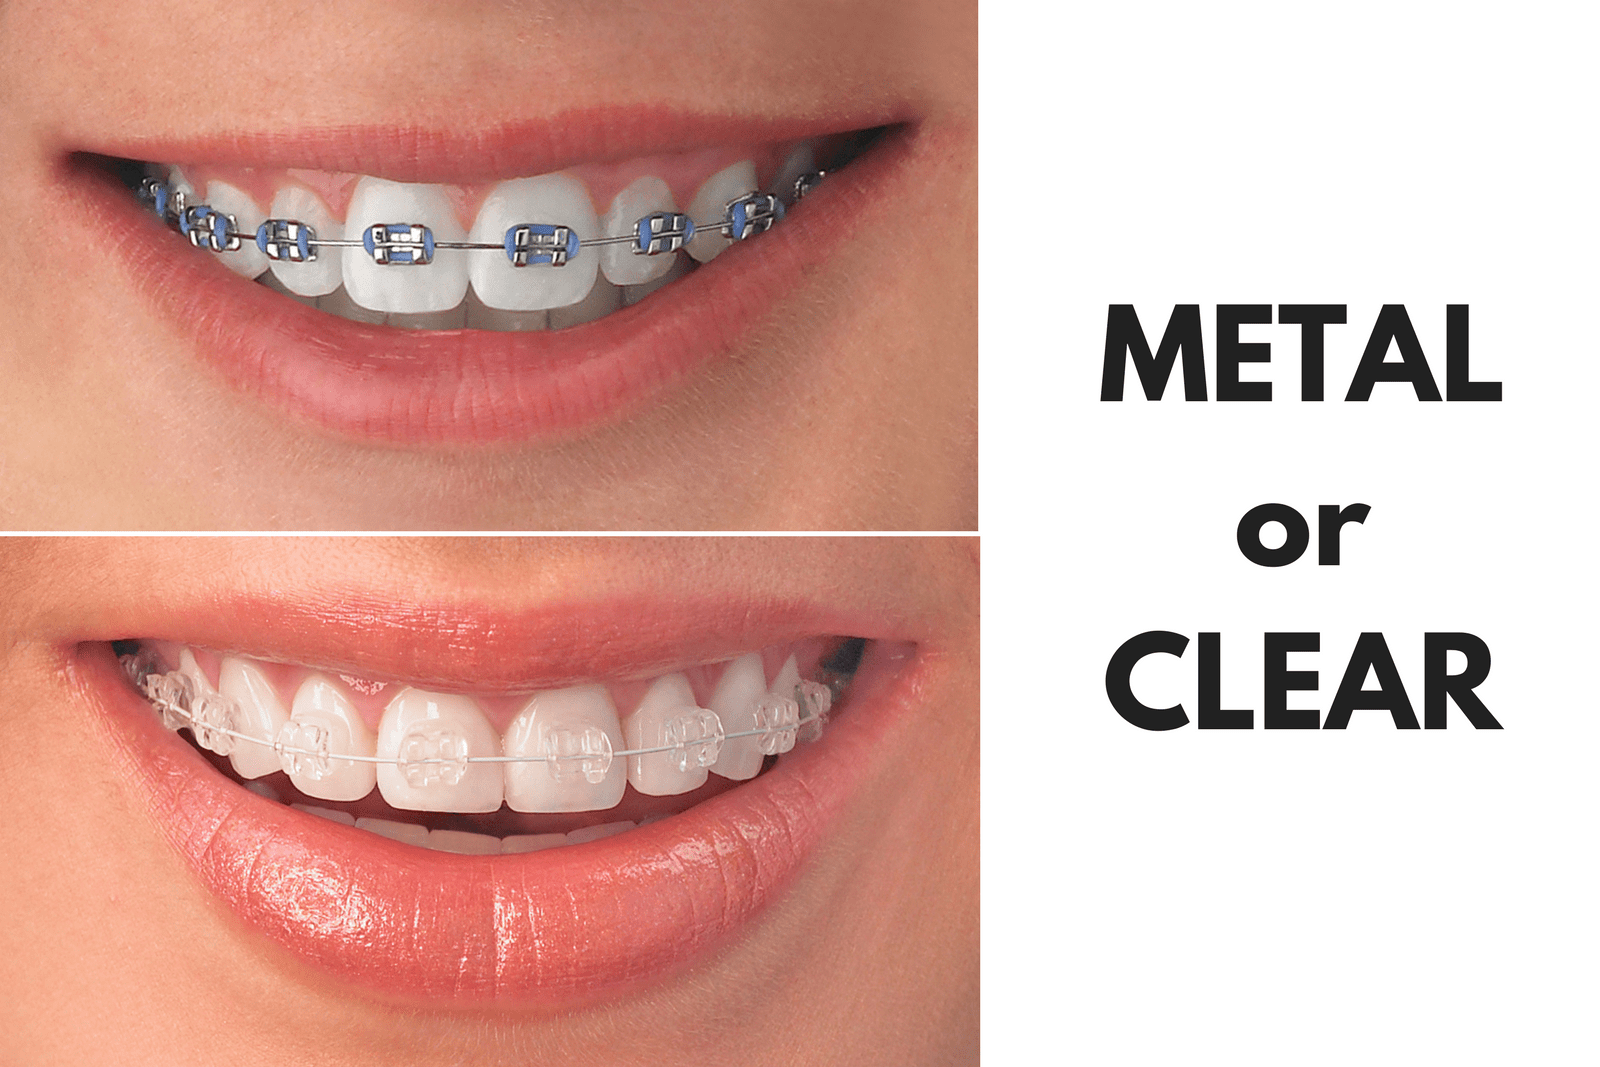 Metal or Clear Braces